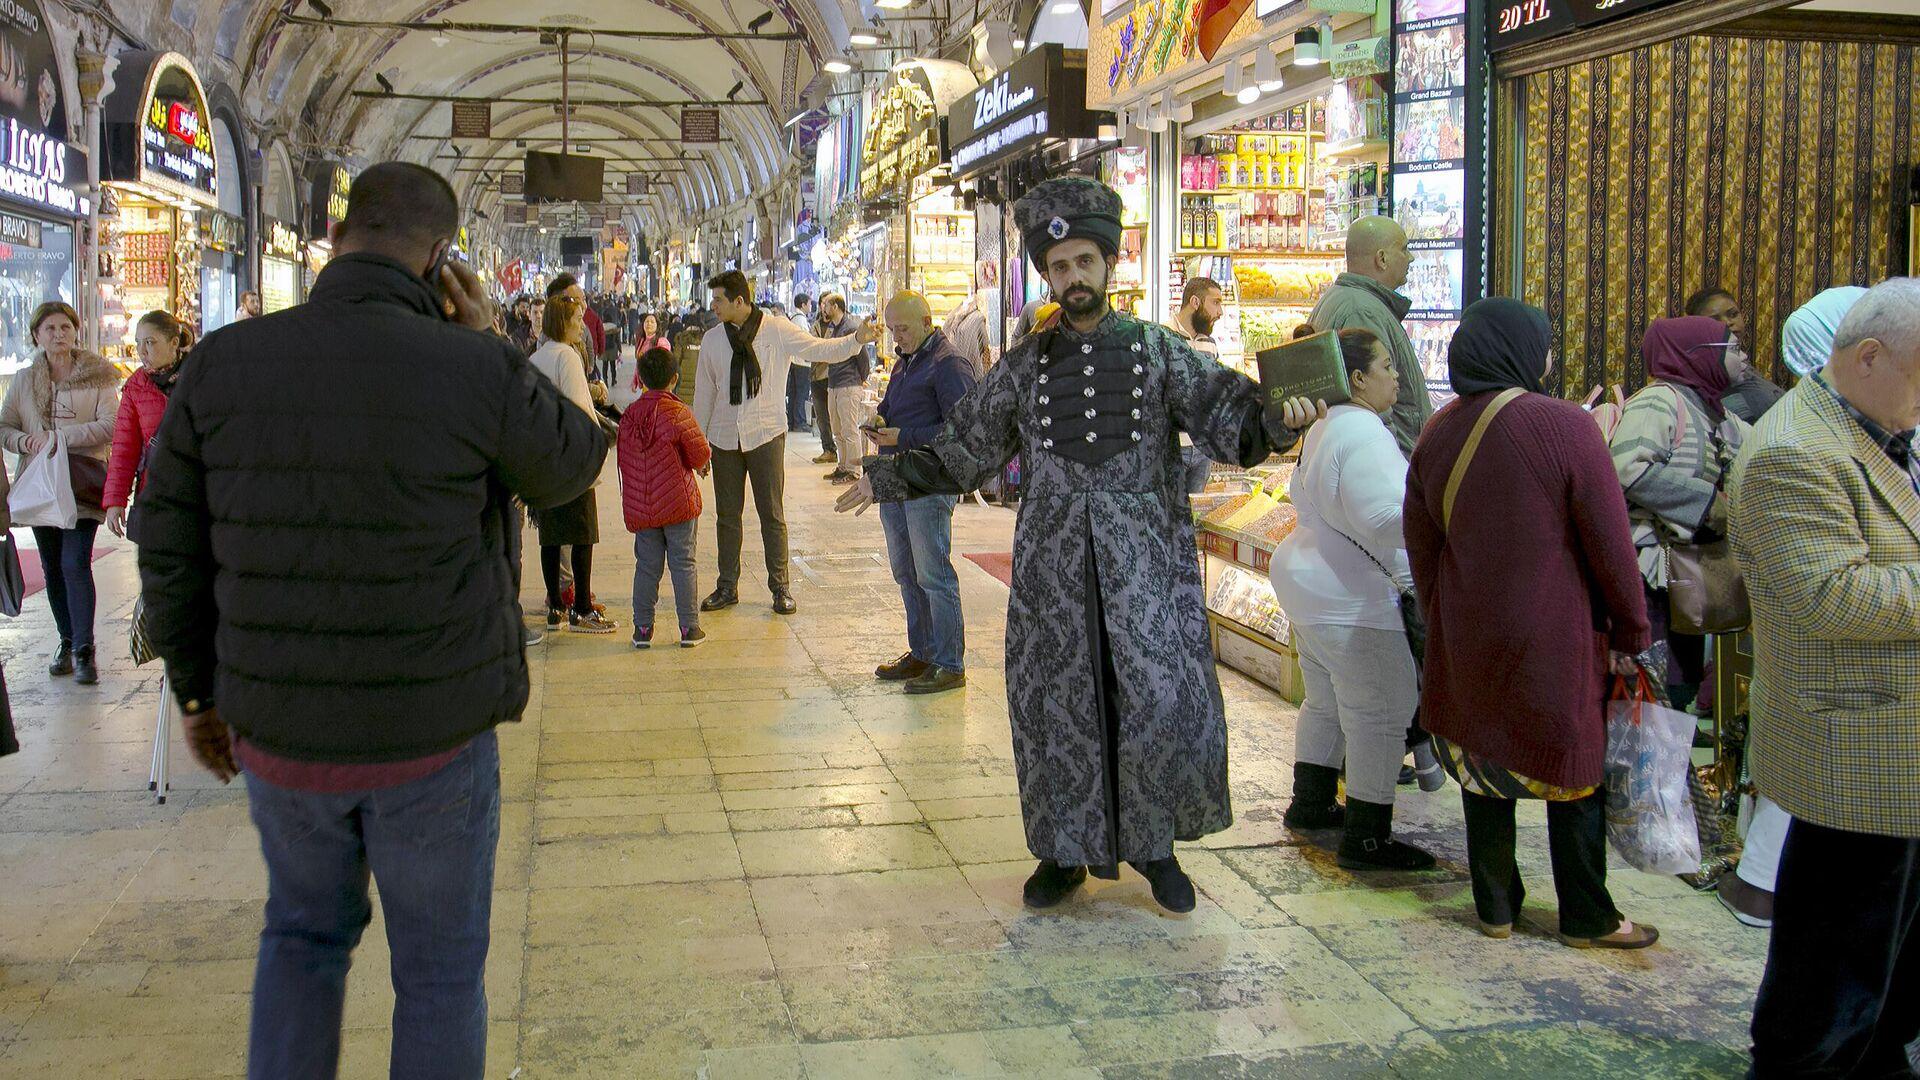 Гранд-базар в Стамбуле - РИА Новости, 1920, 07.12.2020